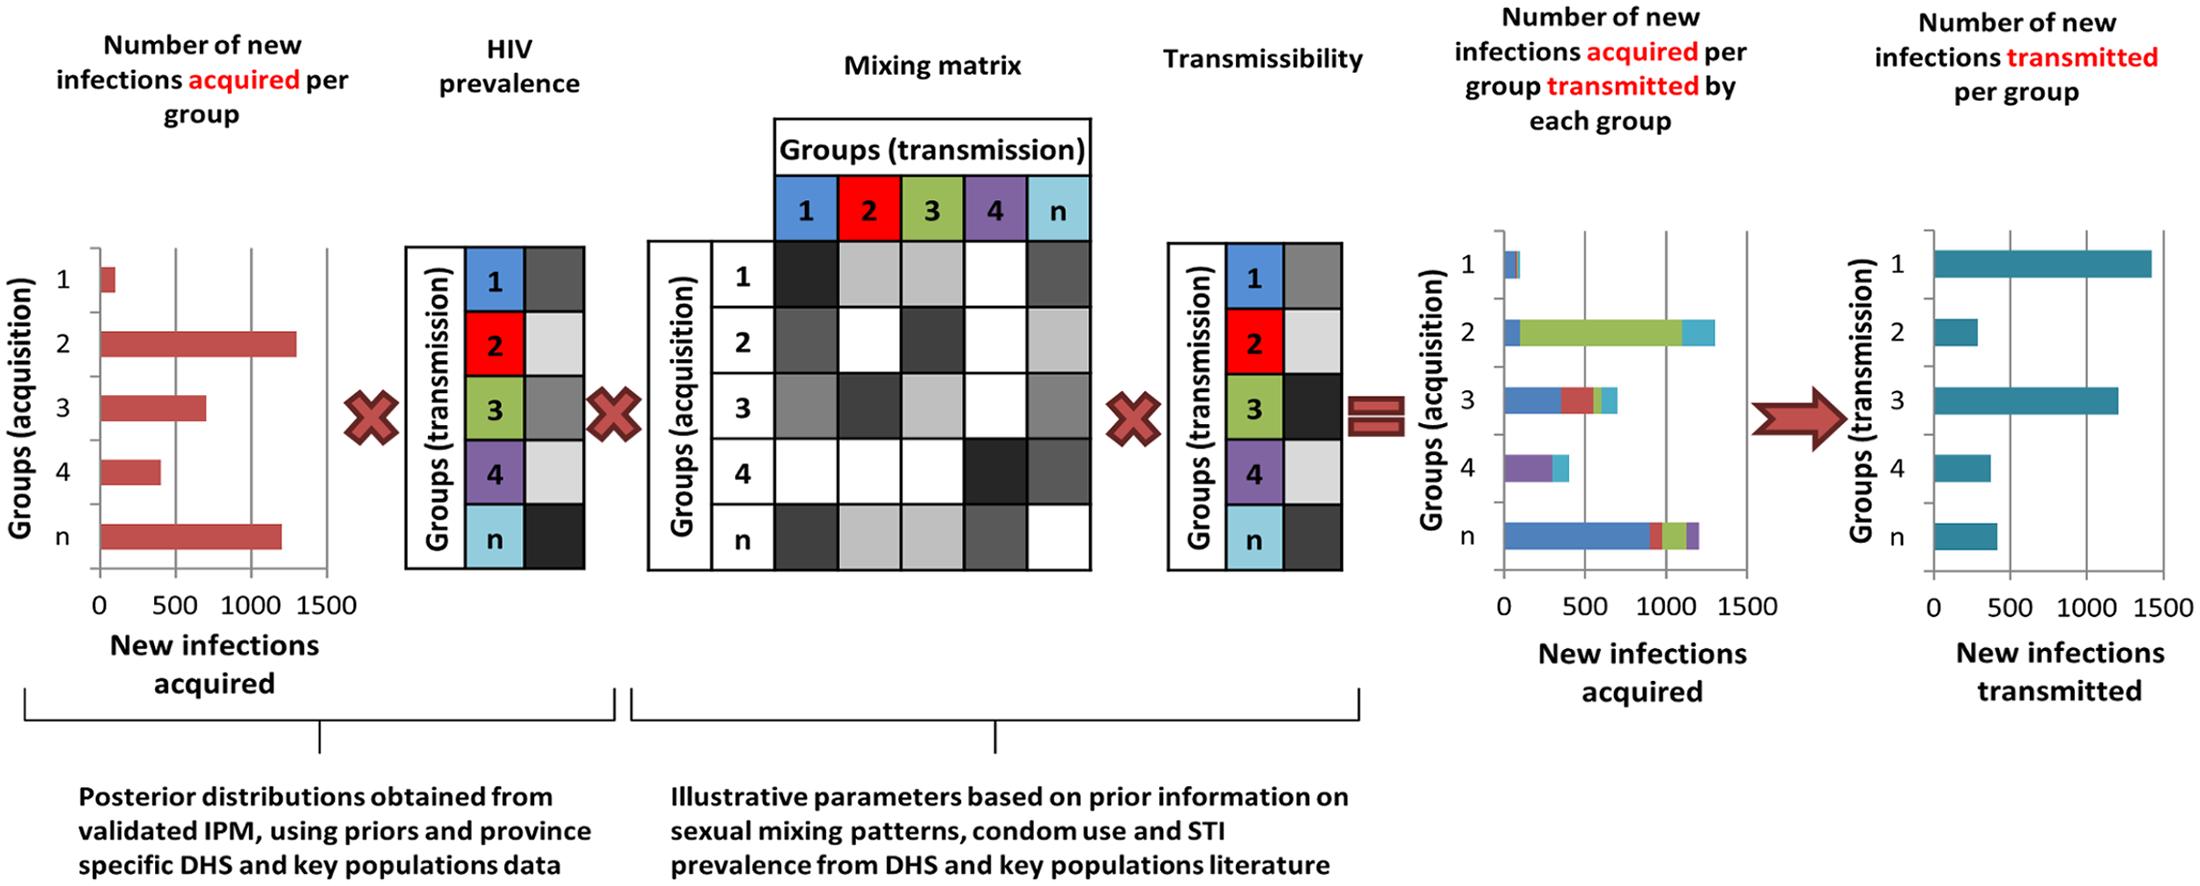 The transmission model based on the Incidence Patterns Model.